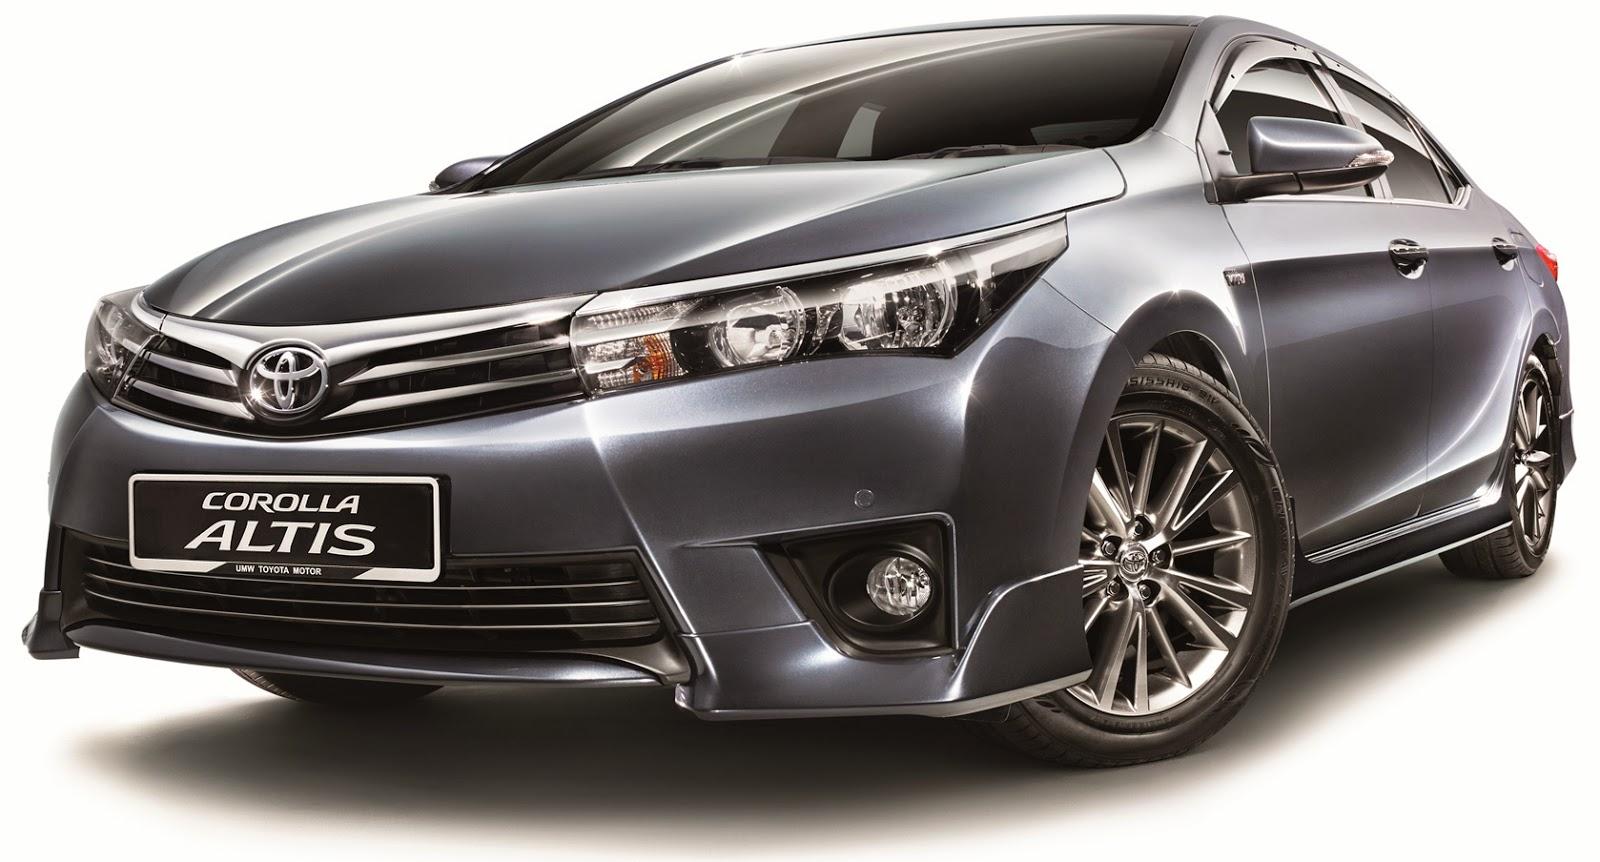 Altis 1.8G toyota tan cang -  - Giá xe Toyota Corolla Altis 1.8G CVT - Đánh giá chi tiết Toyota Corolla Altis 1.8G CVT 2015